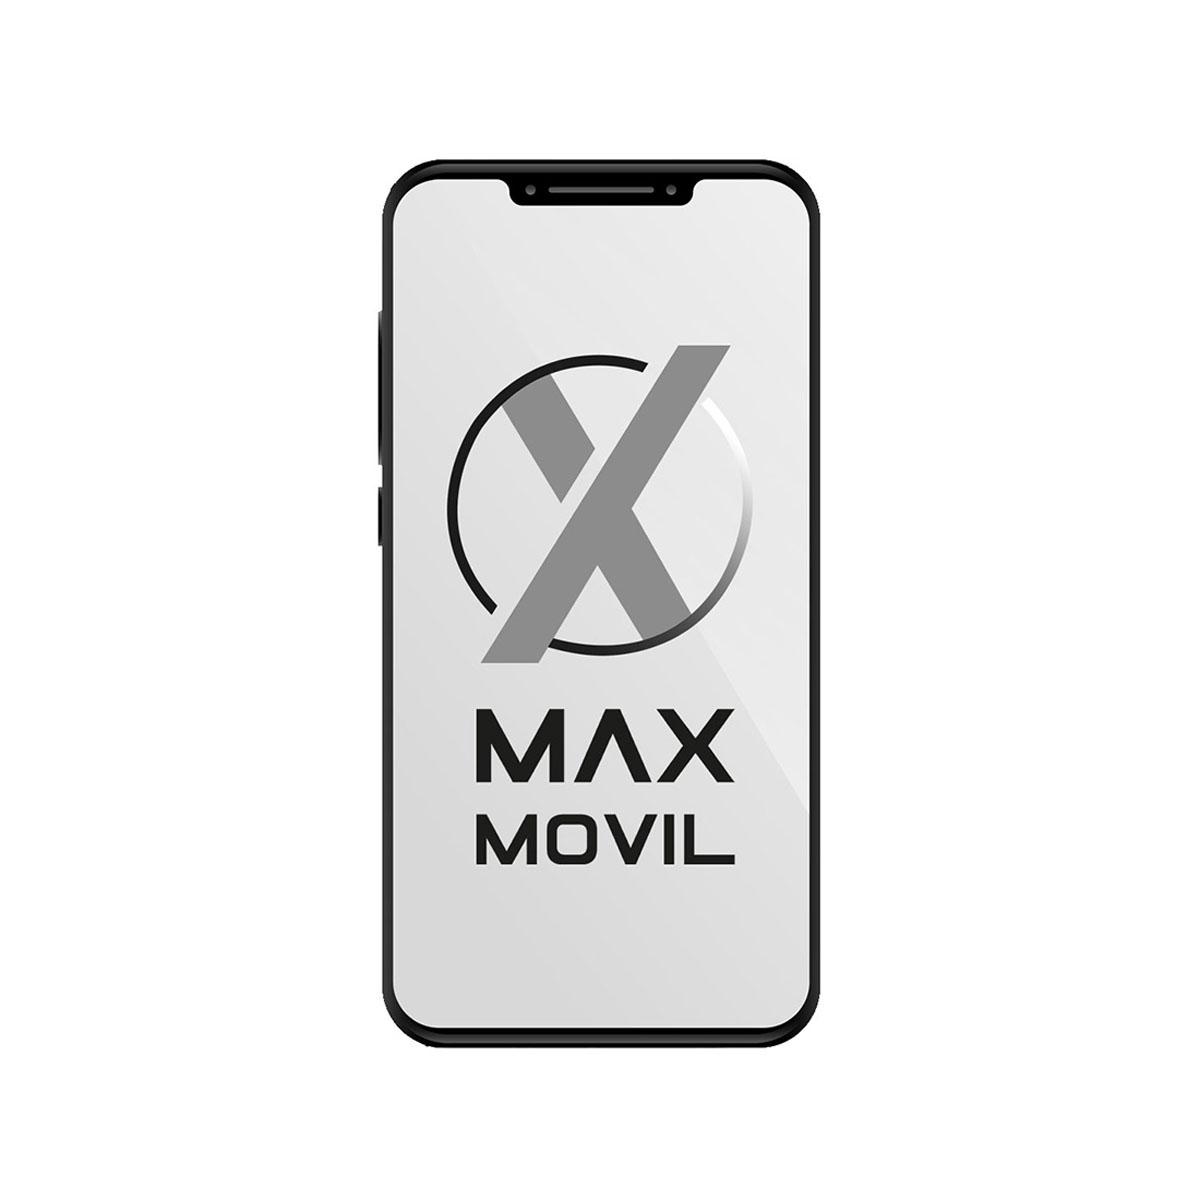 Motorola Moto G 2015 XT1541 2+16 GB blanco libre